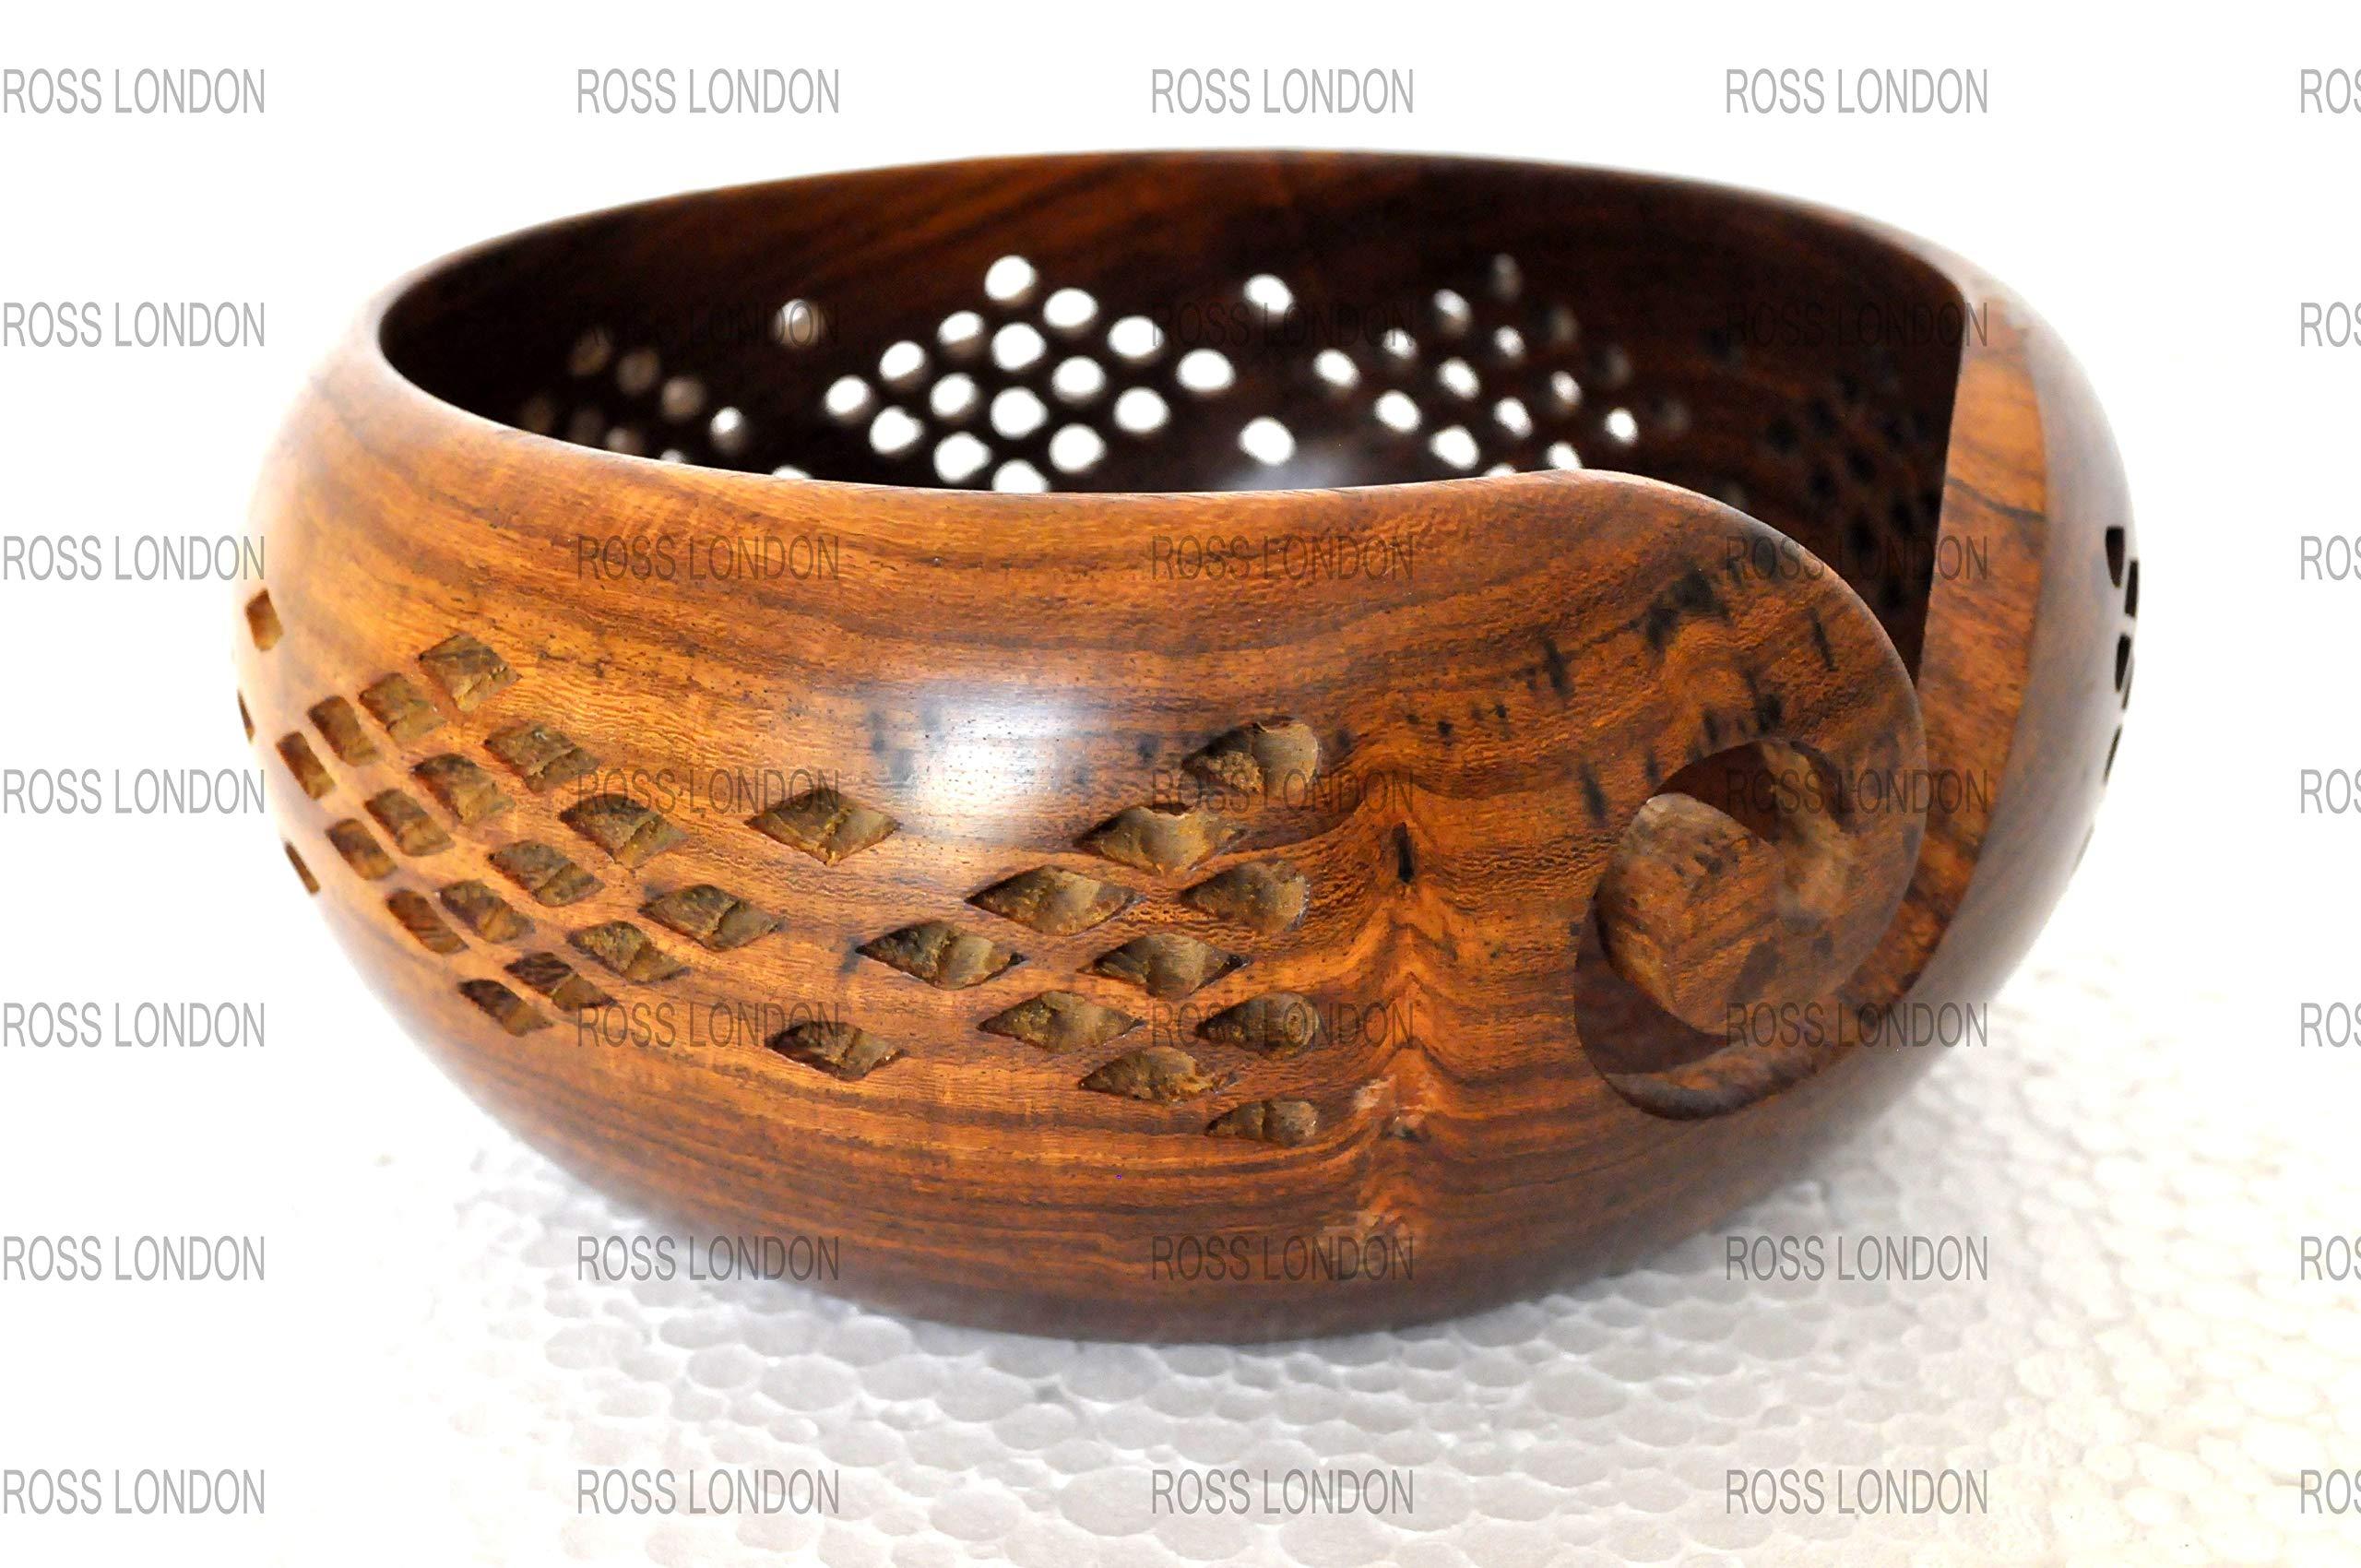 6'' x 3'' Handmade Knitting Yarn Organizer Bowl Wooden Circular Crocheting Storage Tool